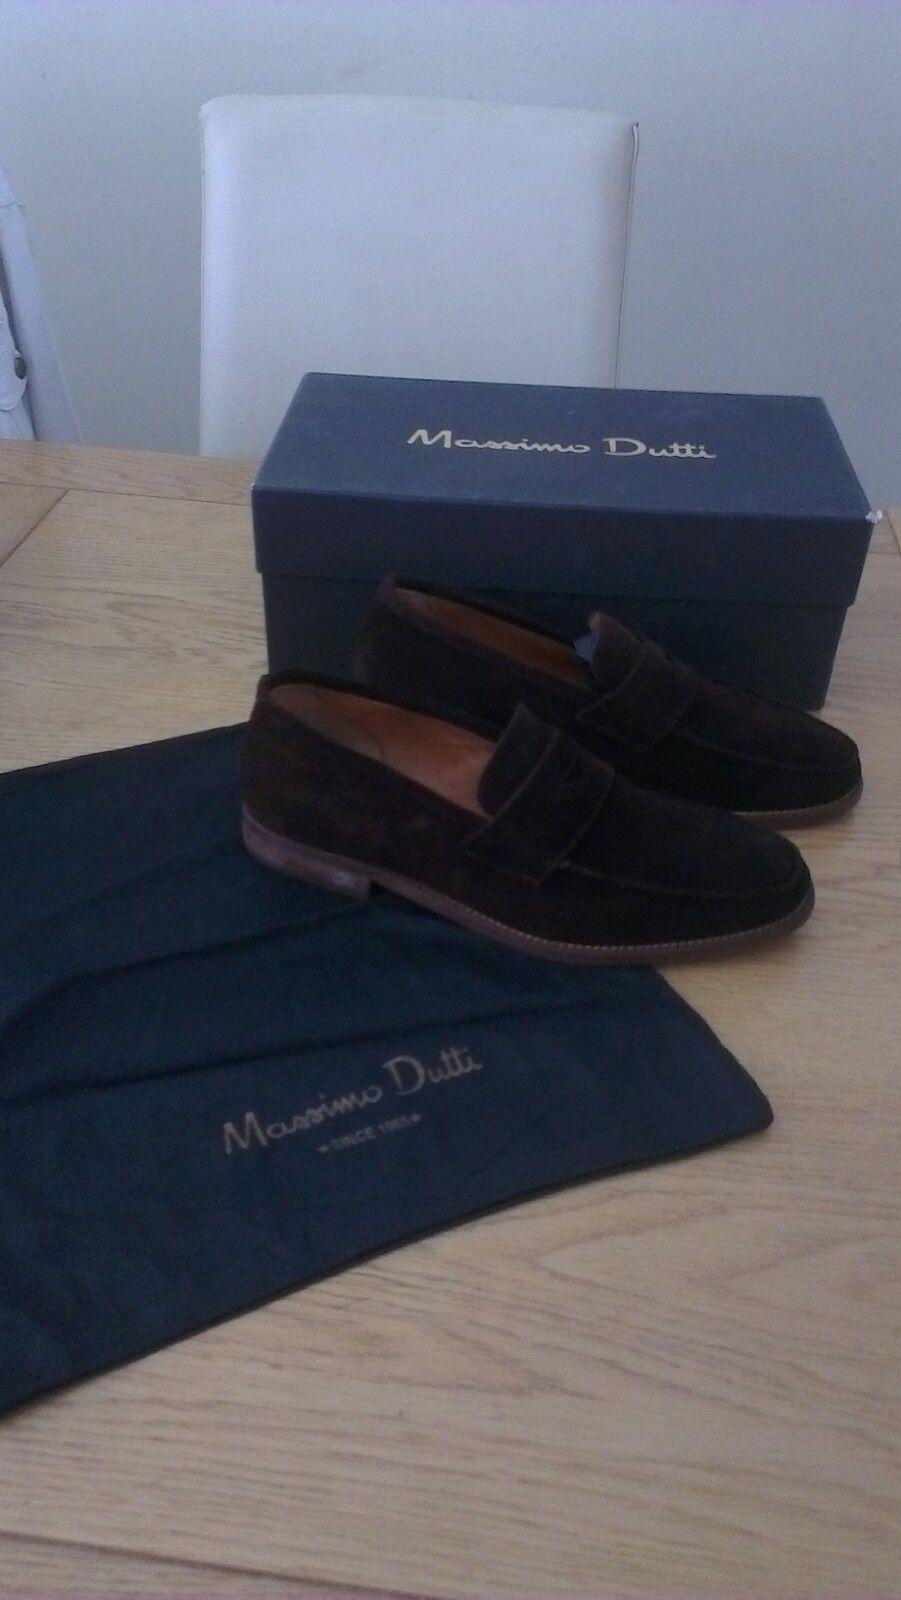 MASSIMO DUTTI BROWN SUEDE MOCASIN 6 Schuhe - UK SIZE 6 MOCASIN / 40 - EX CONDITION 0c3daf